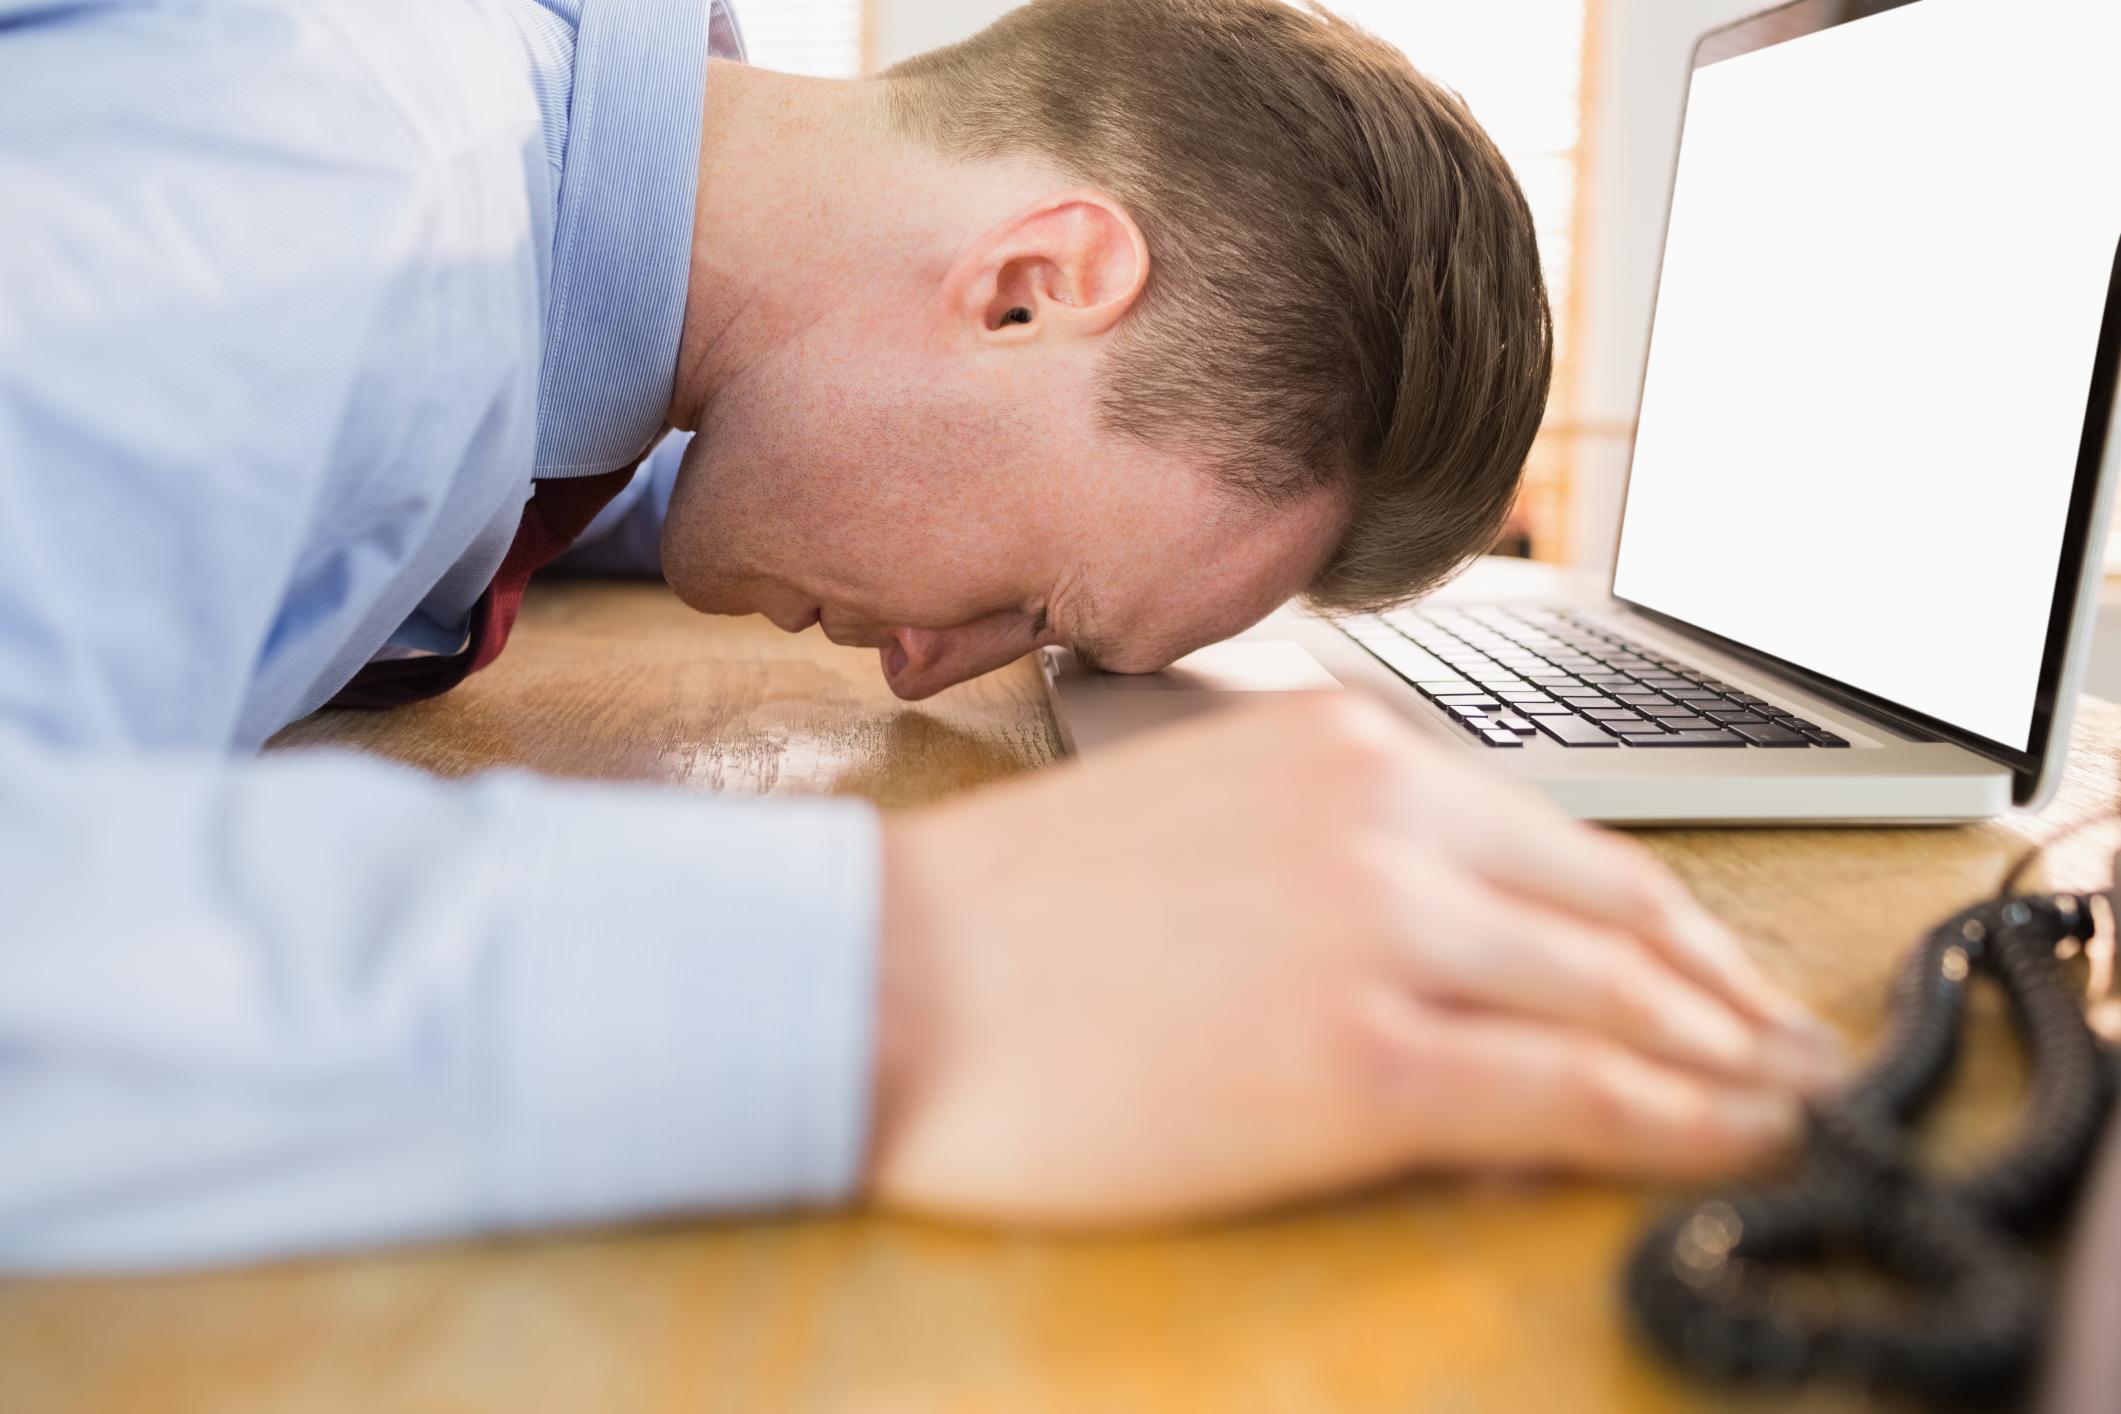 sad man on laptop computer